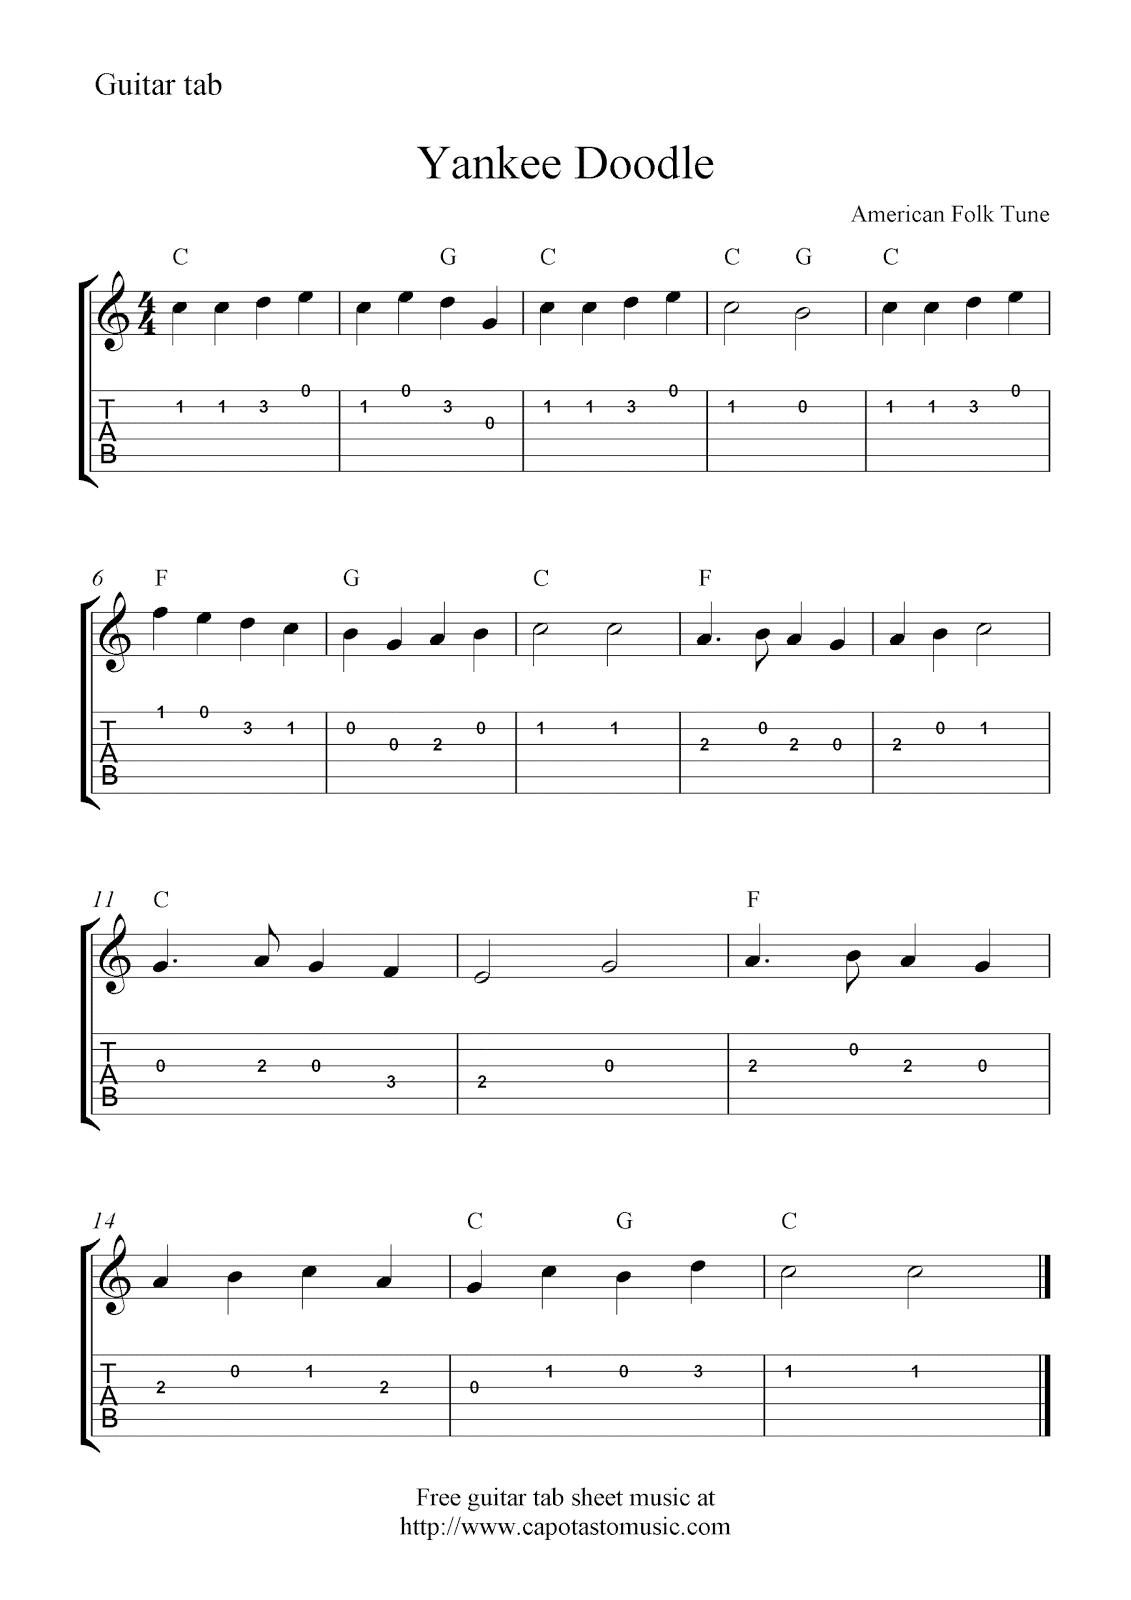 Yankee Doodle,easy Free Guitar Tab Sheet Music Score - Free Printable Guitar Music